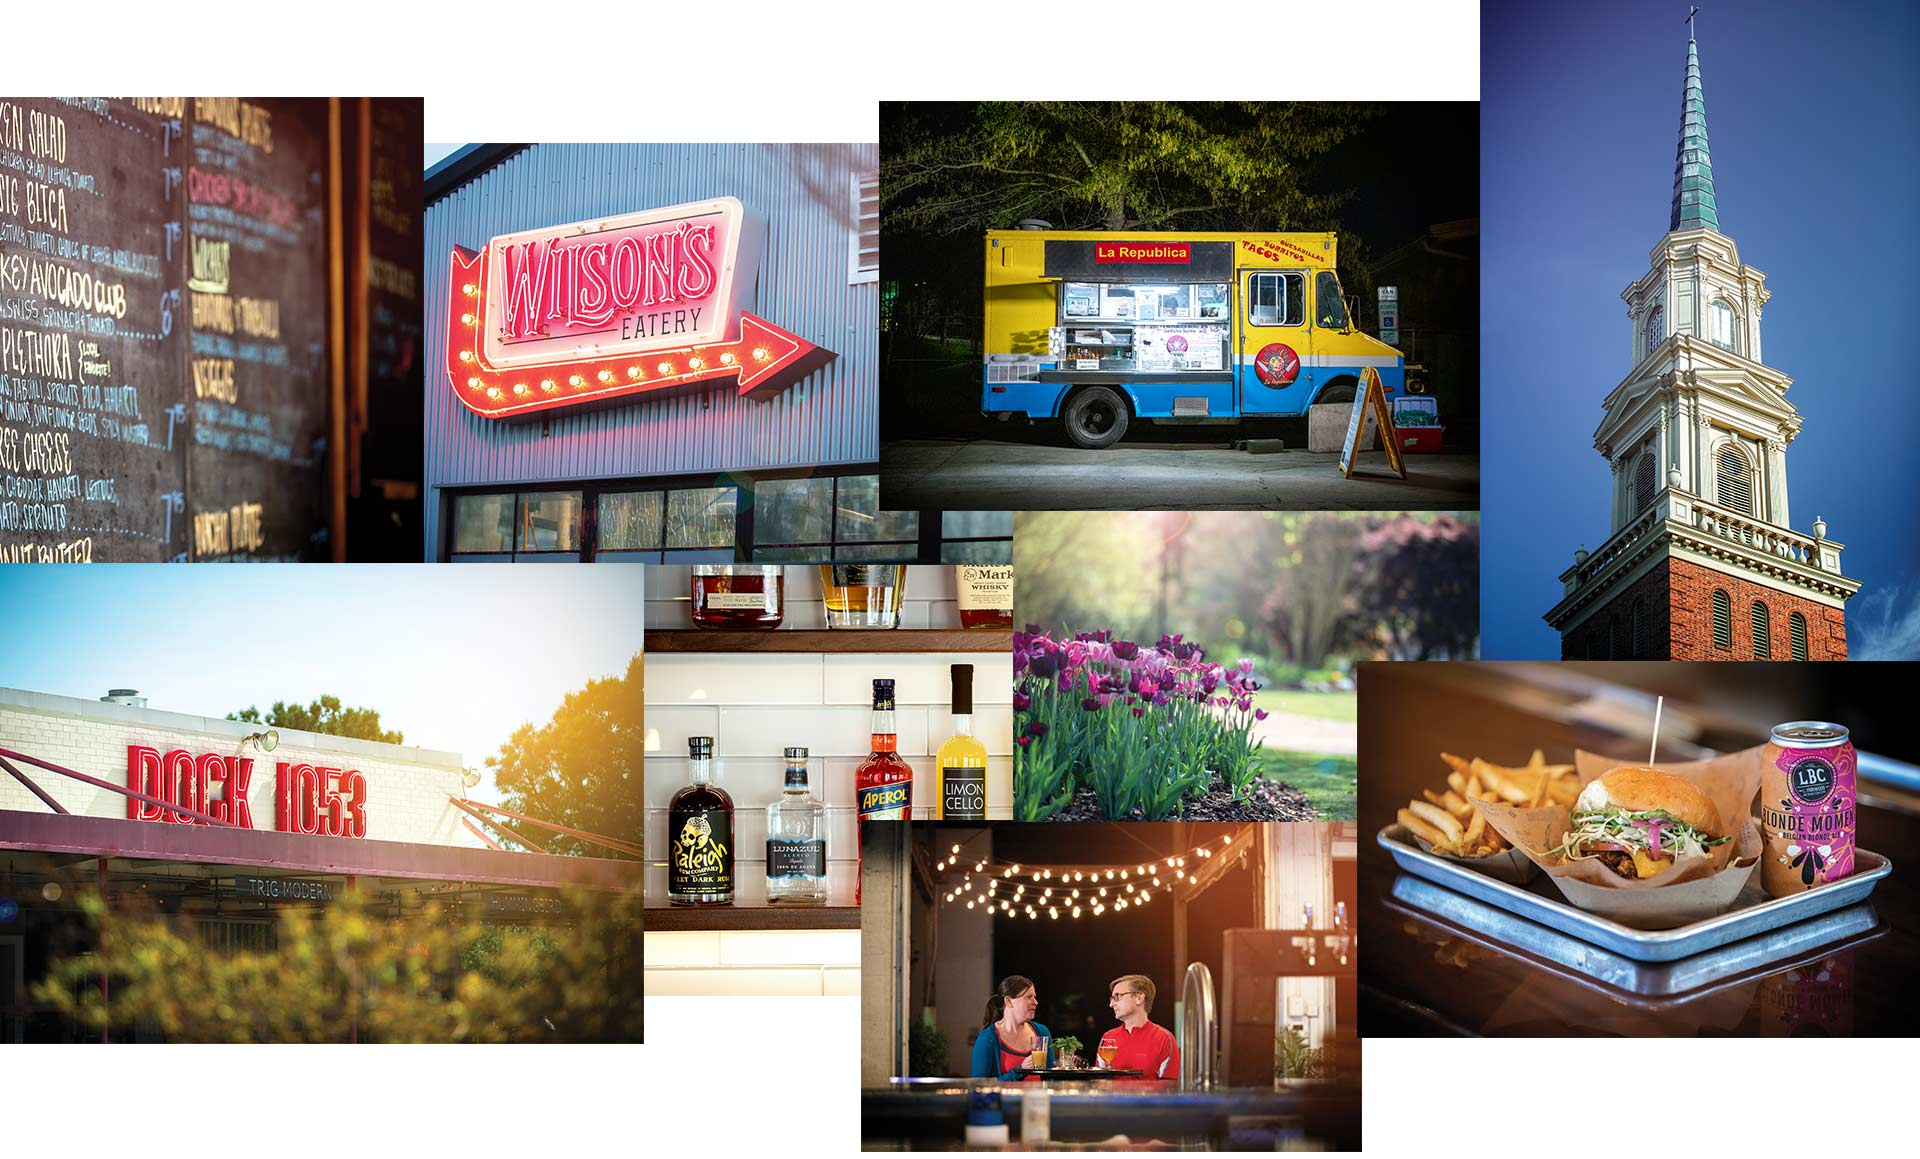 The Carson - Website Design by Springer Studios, Raleigh, NC